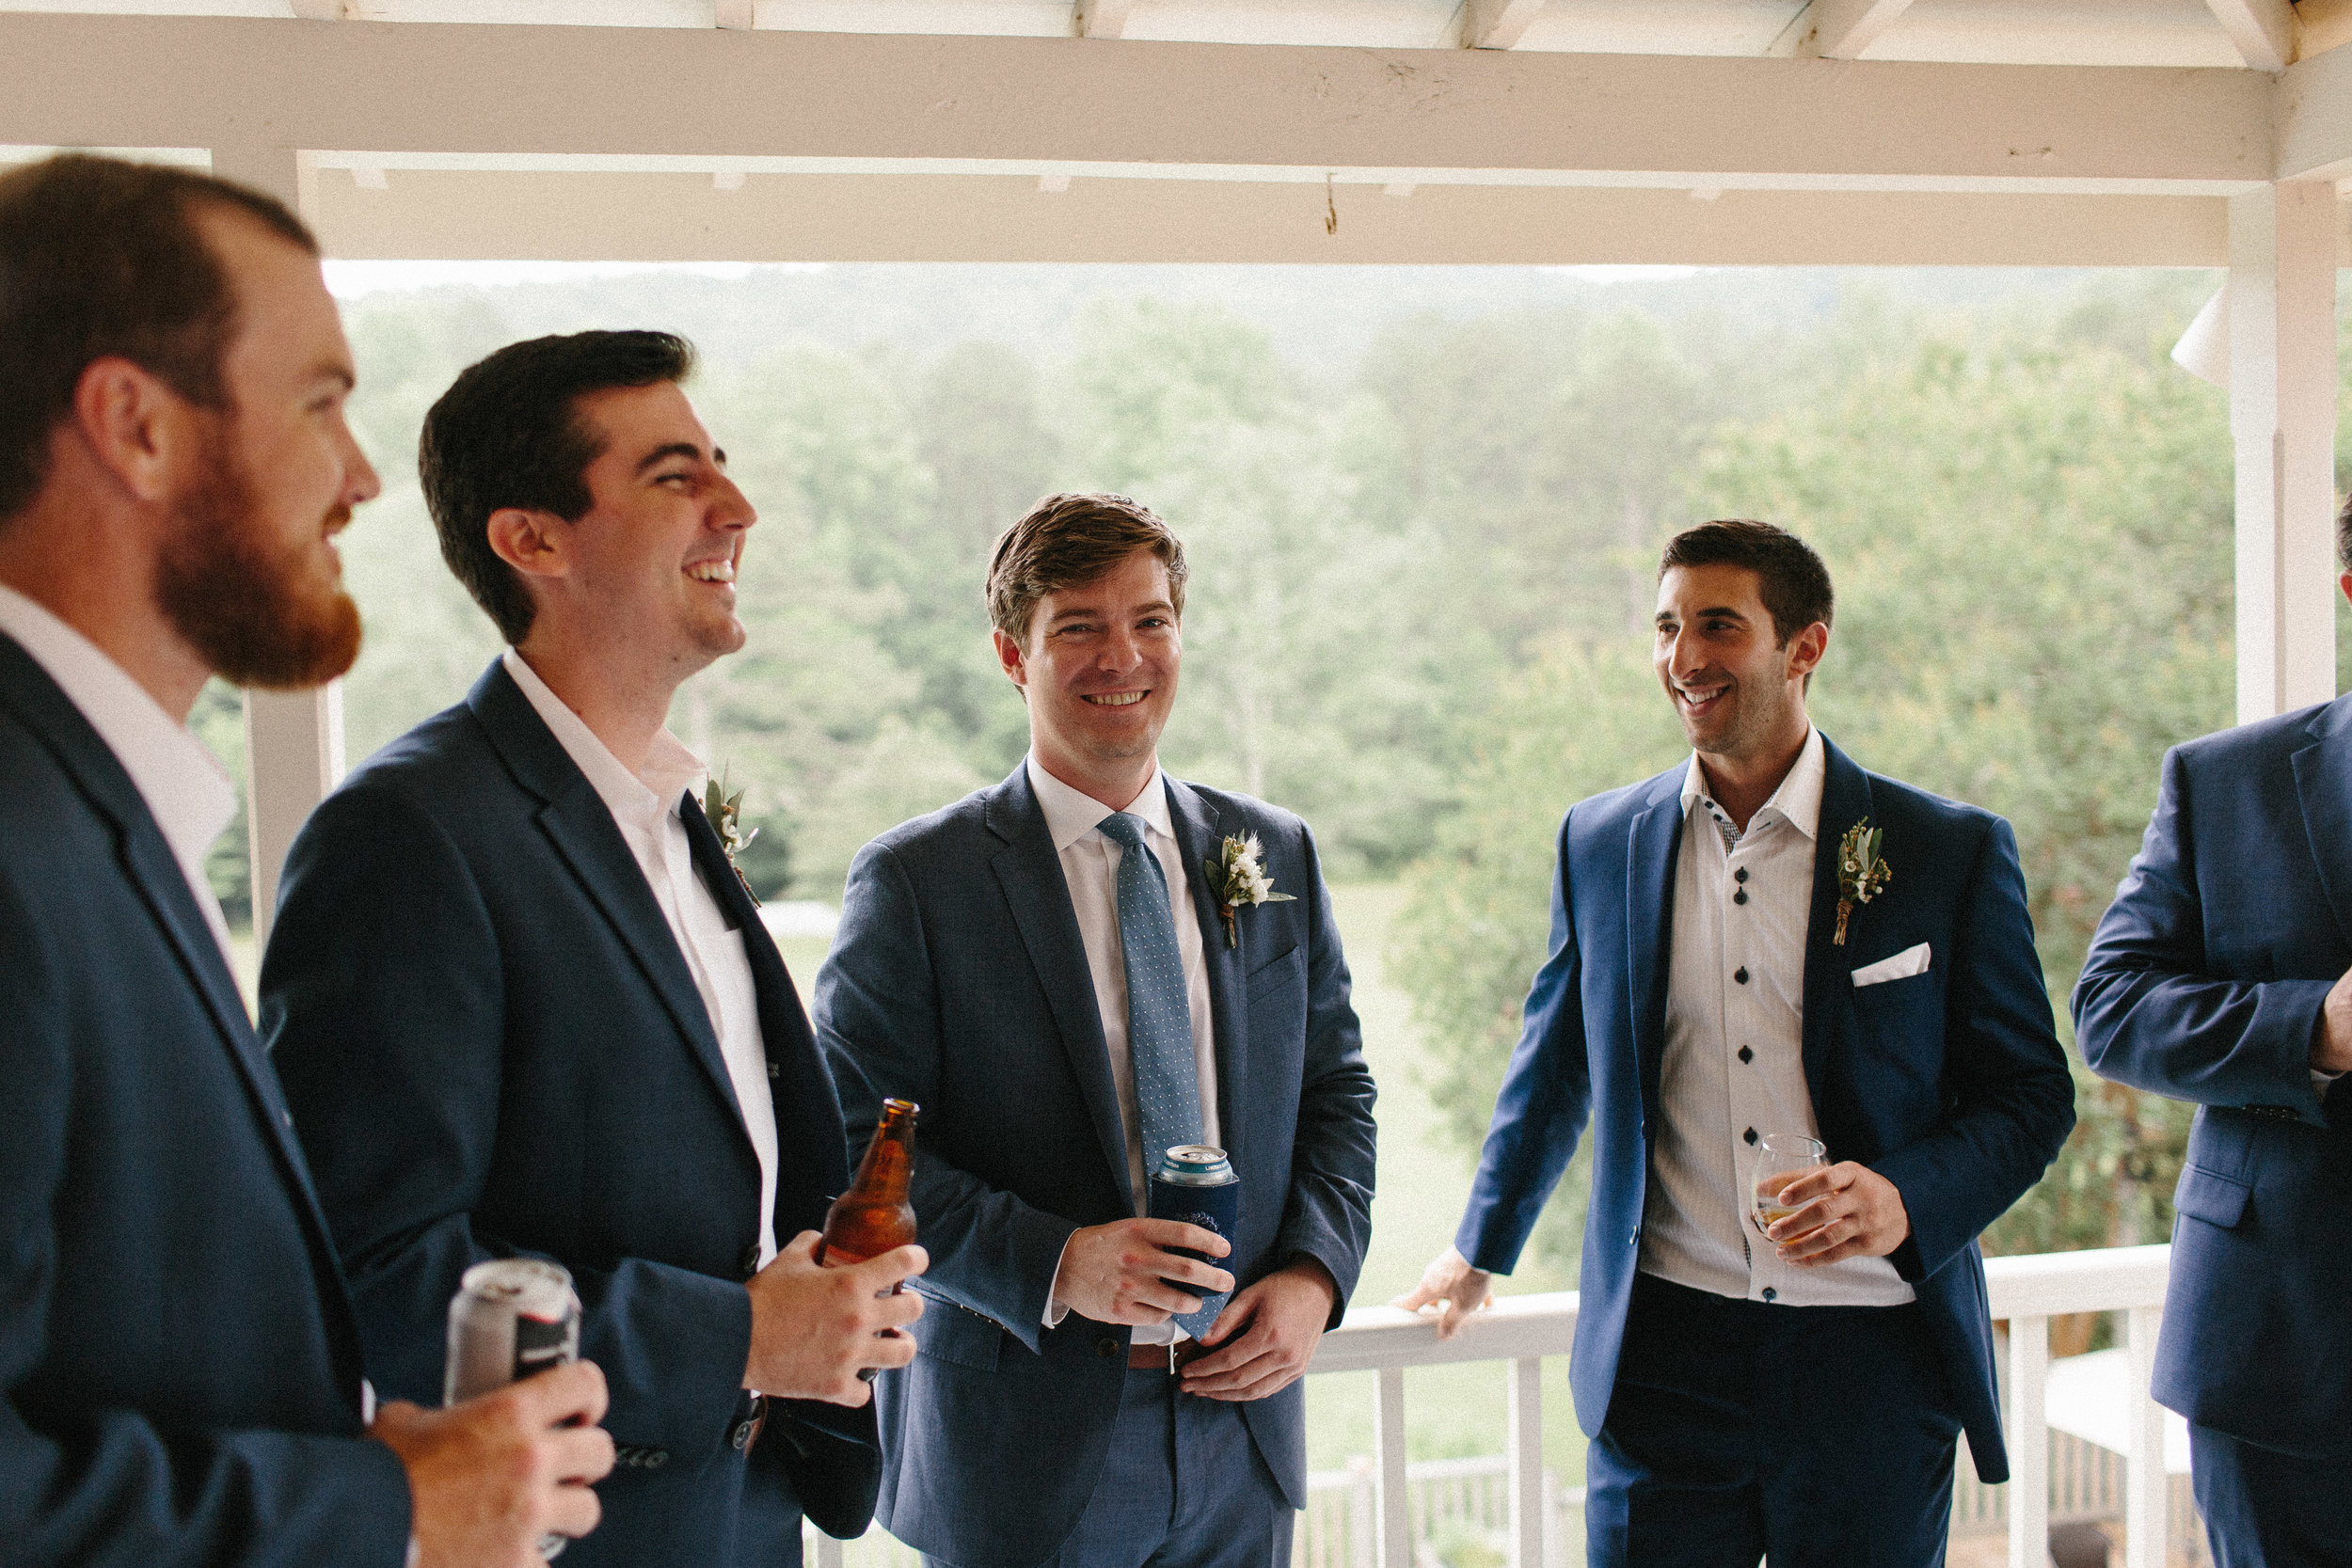 glen_ella_meadow_creekside_atlanta_wedding_photographers_1526.jpg